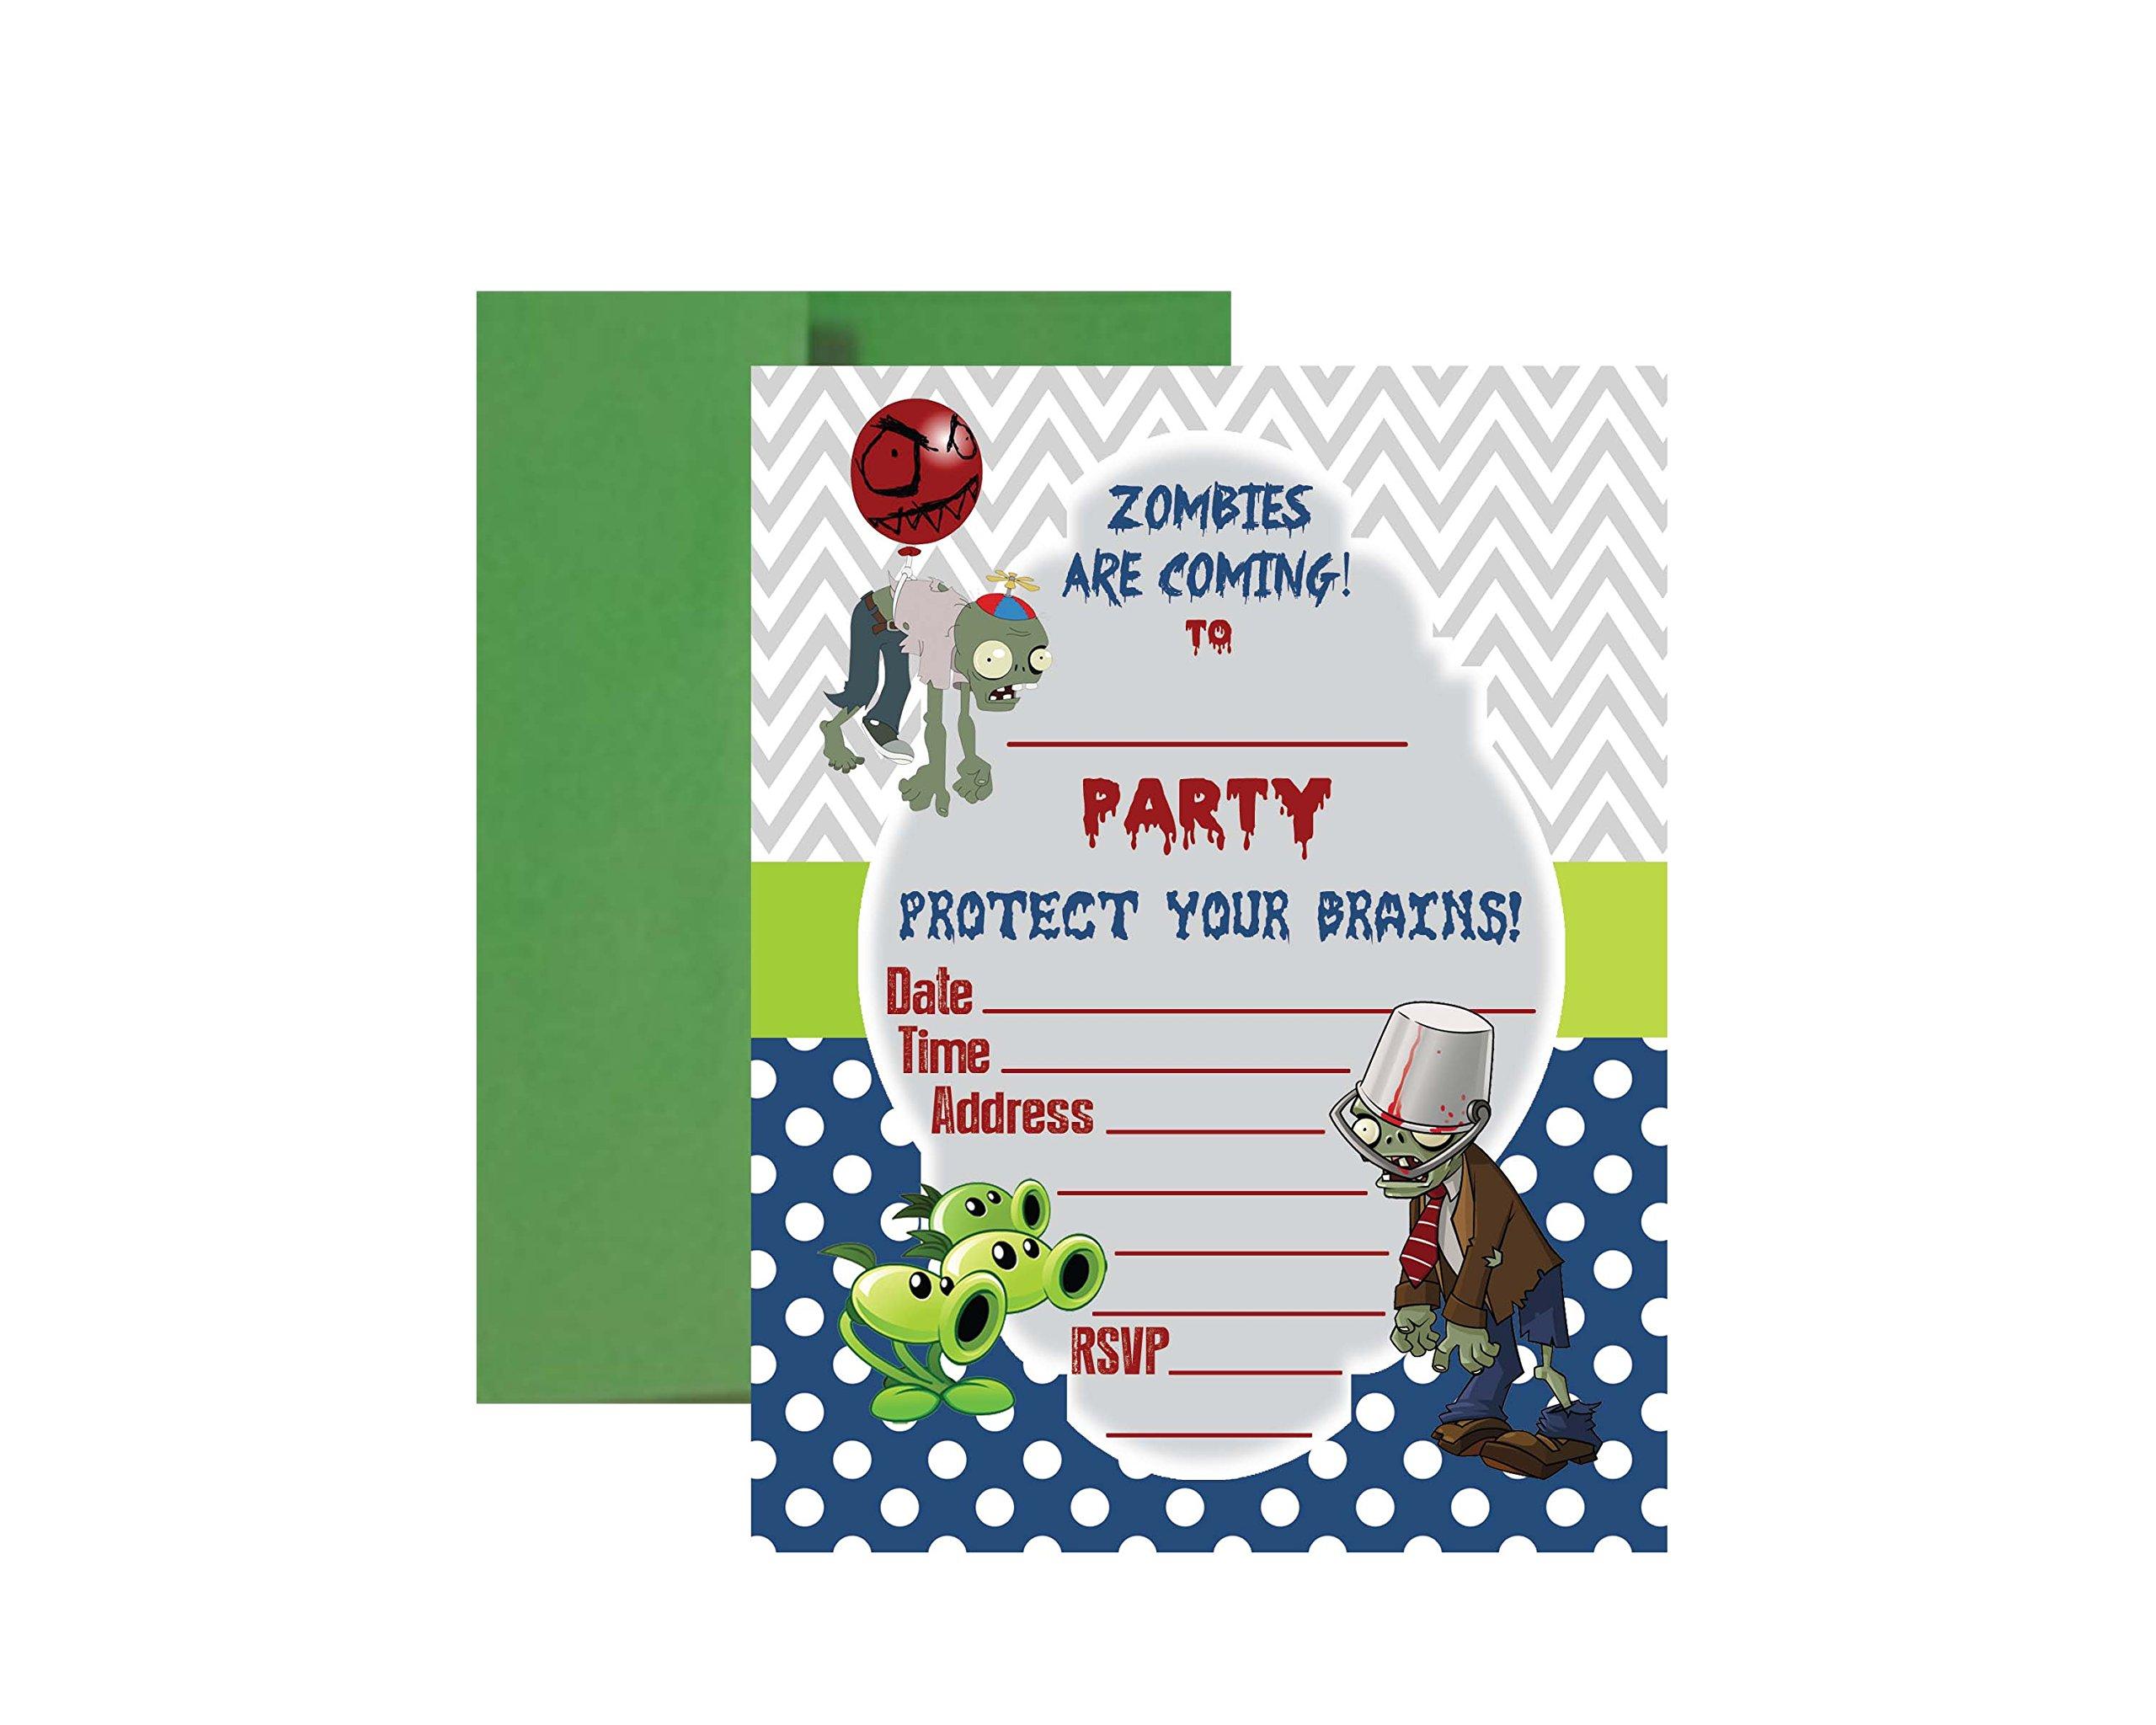 PVZ Birthday Party Supplies (Birthday Invitations): Amazon.com ...